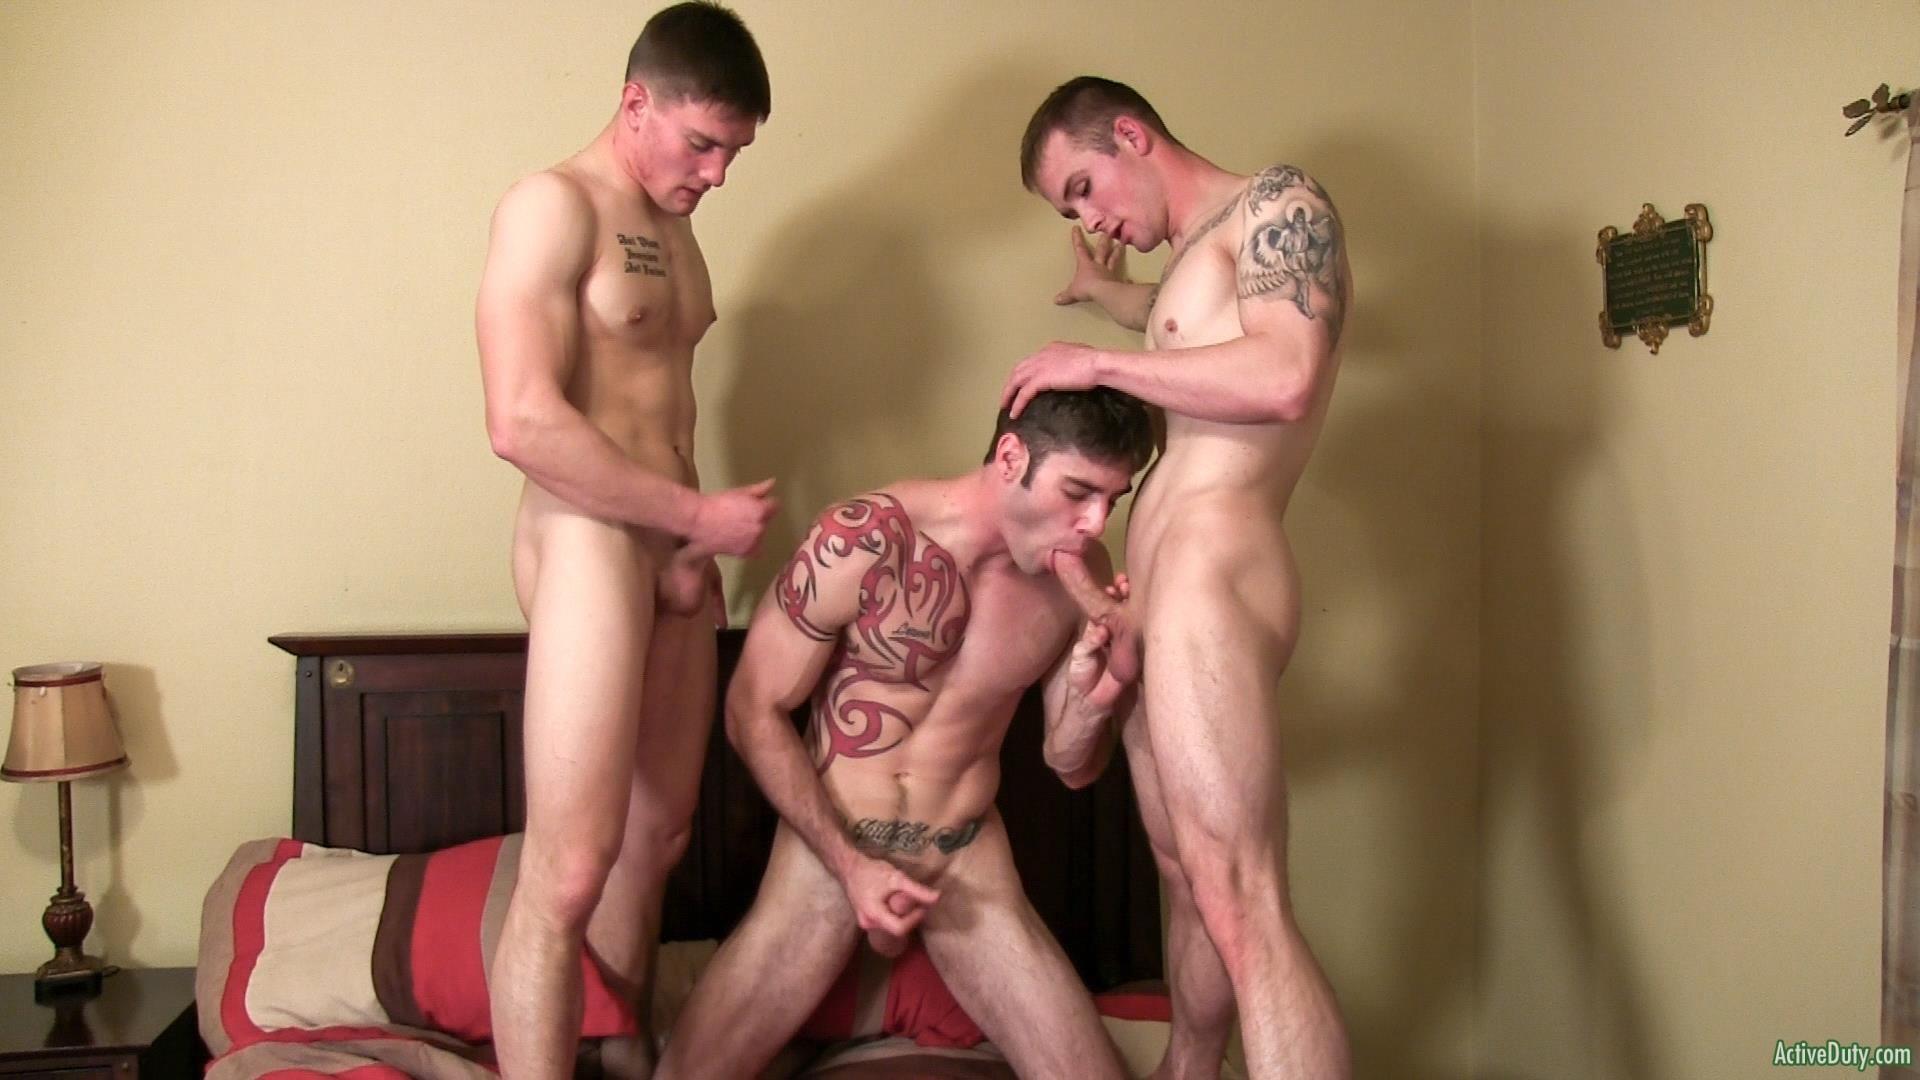 Military gay porn videos